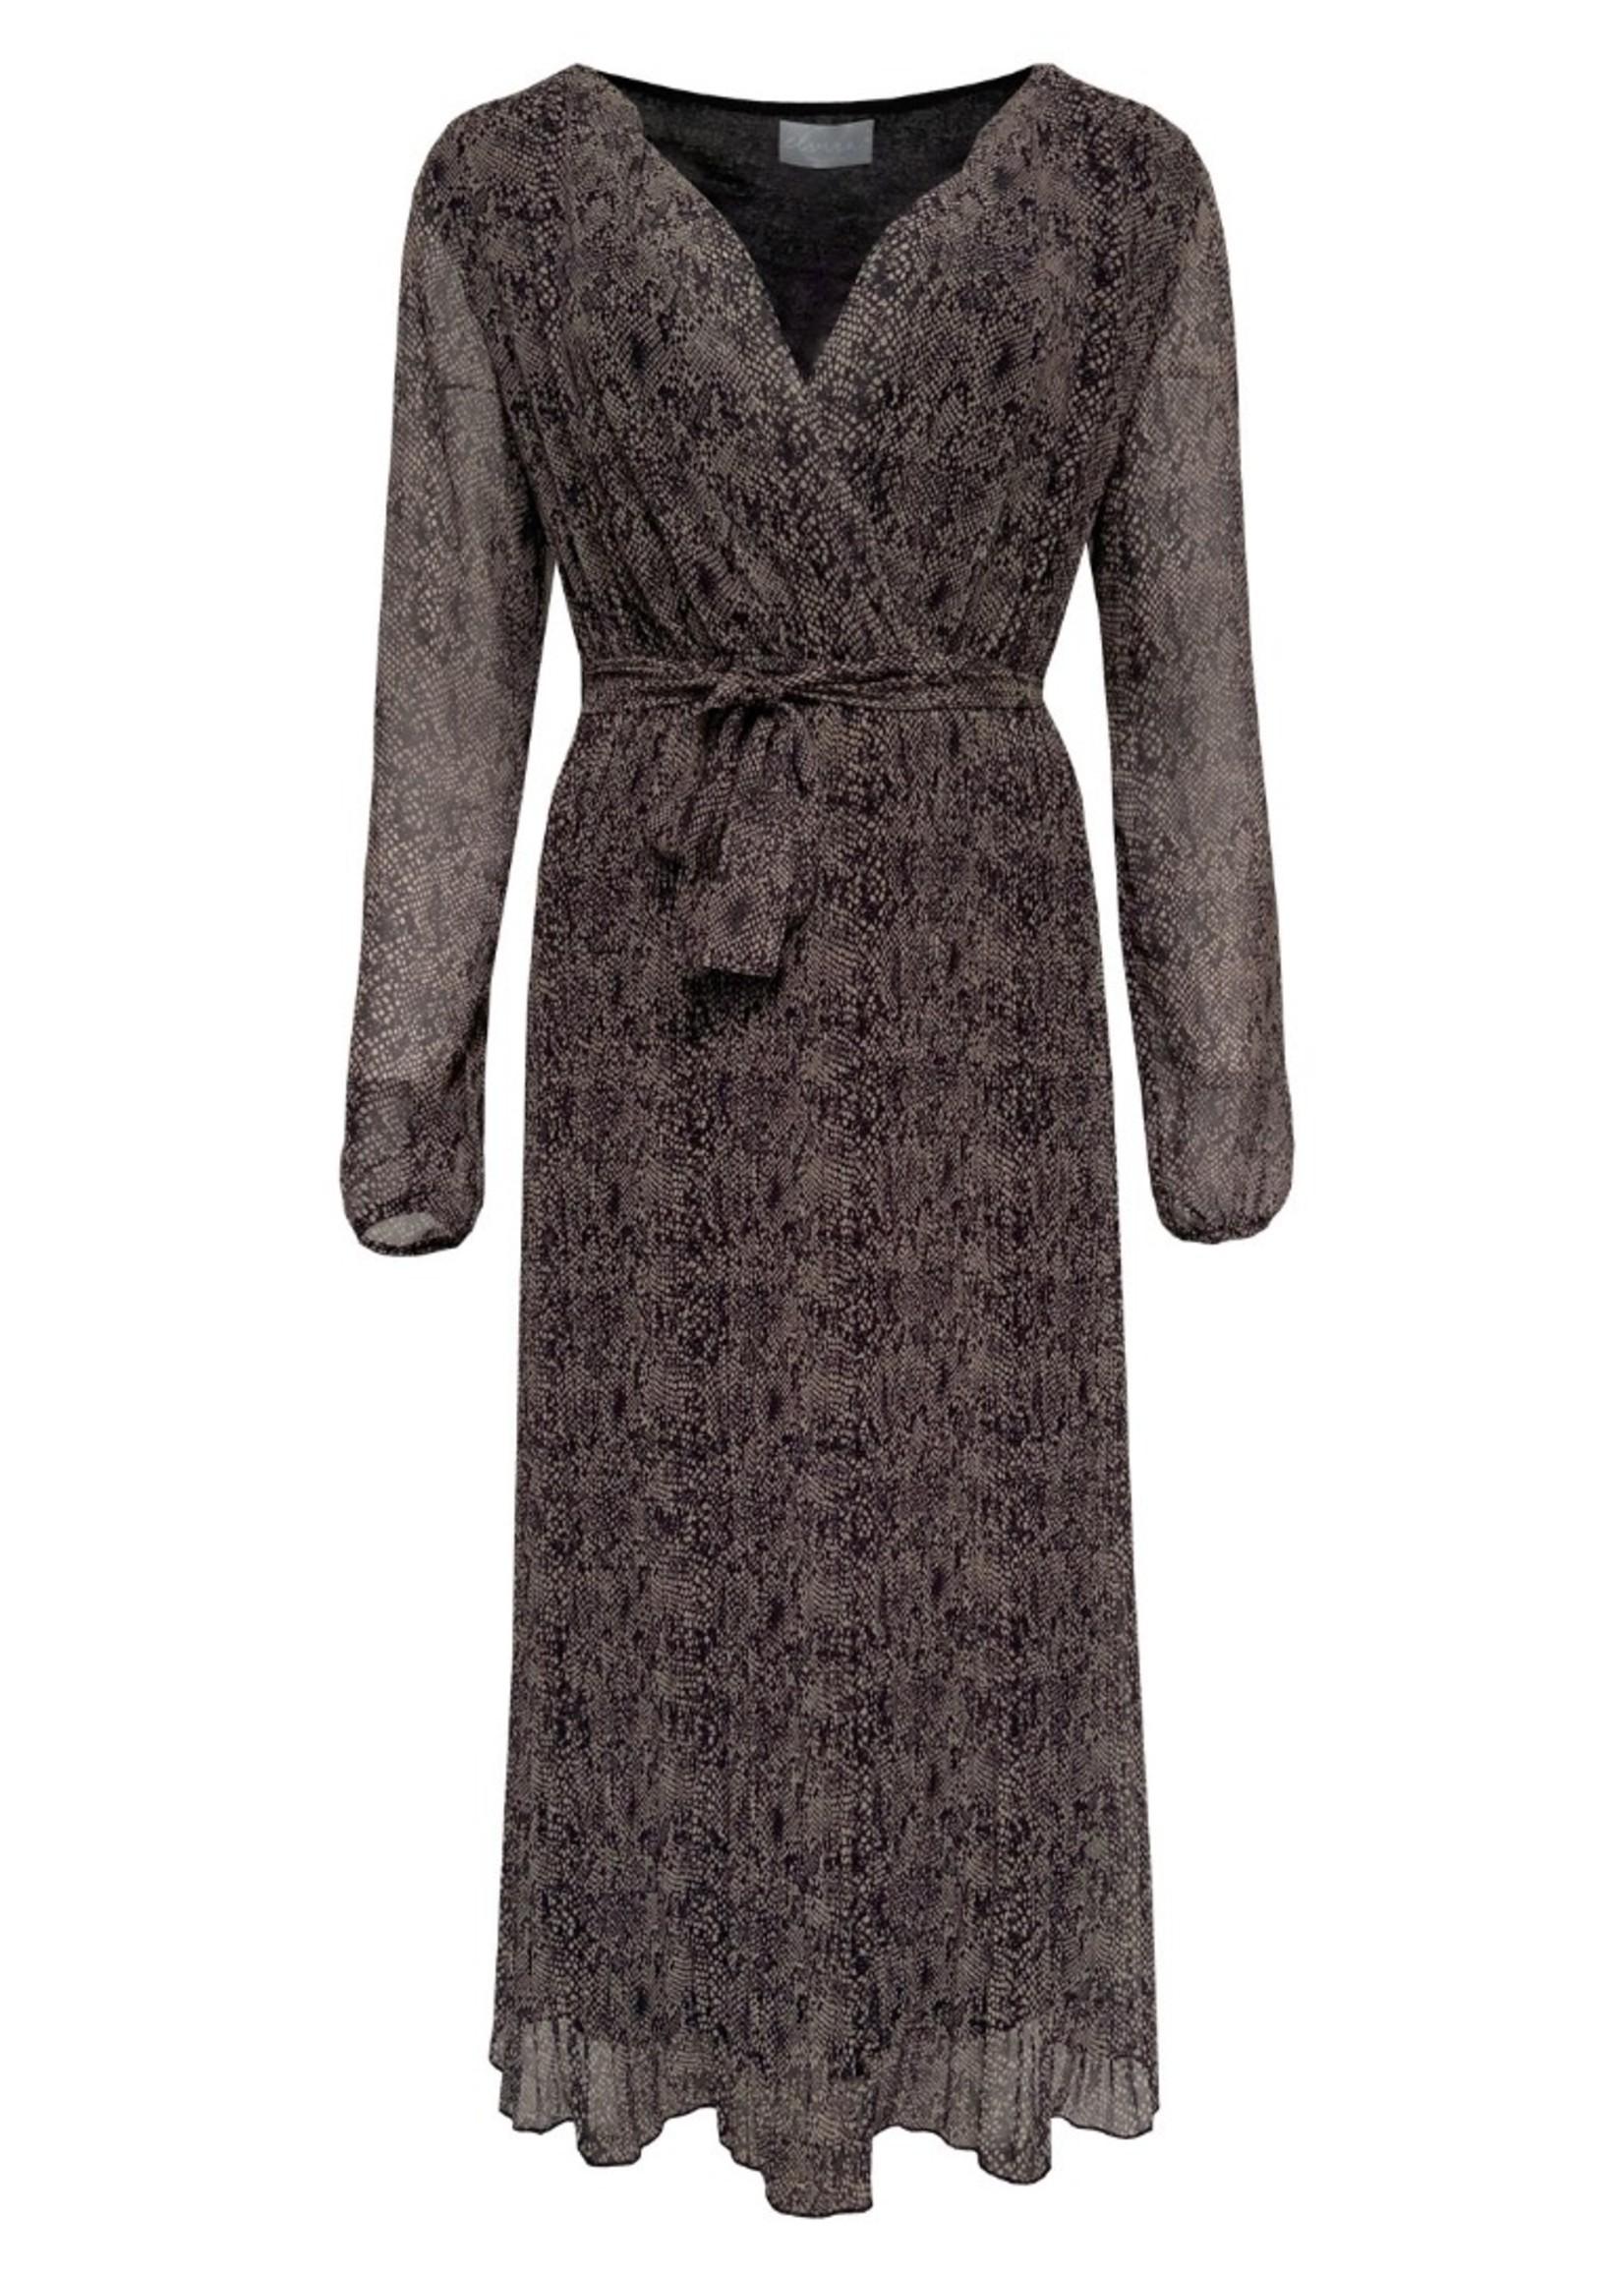 Elvira Collections Elvira Collections Suzy Plissé Dress